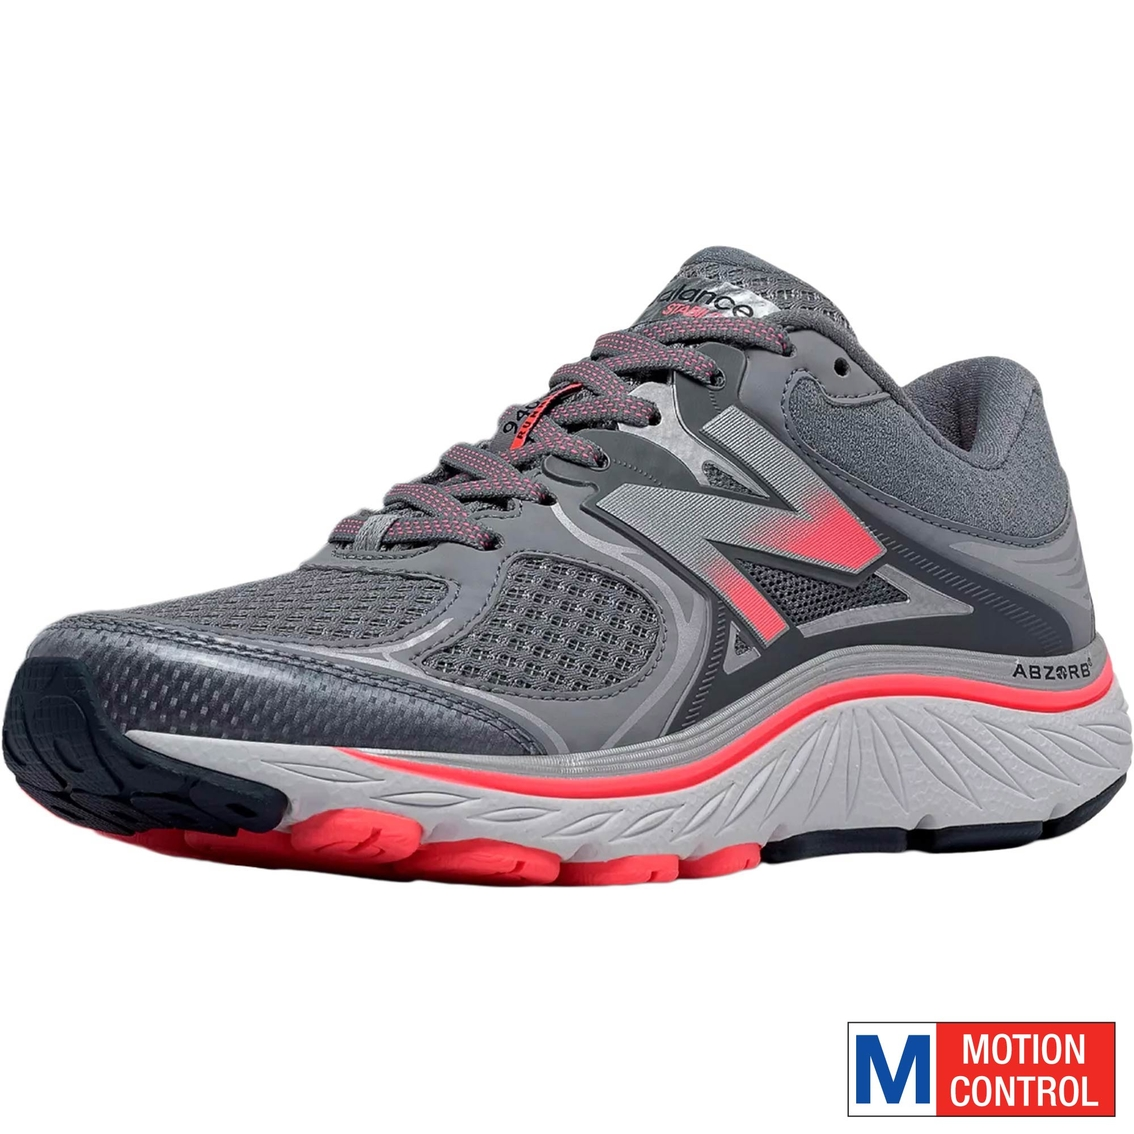 29e5019656821 New Balance Women's W940gp3 Running Shoes | Running | Back To School ...